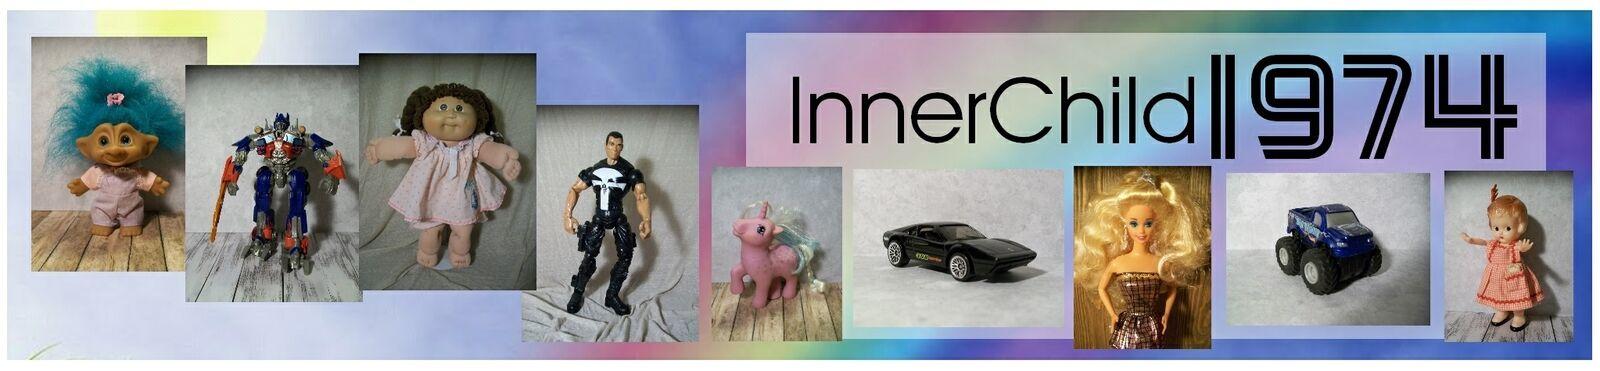 InnerChild1974